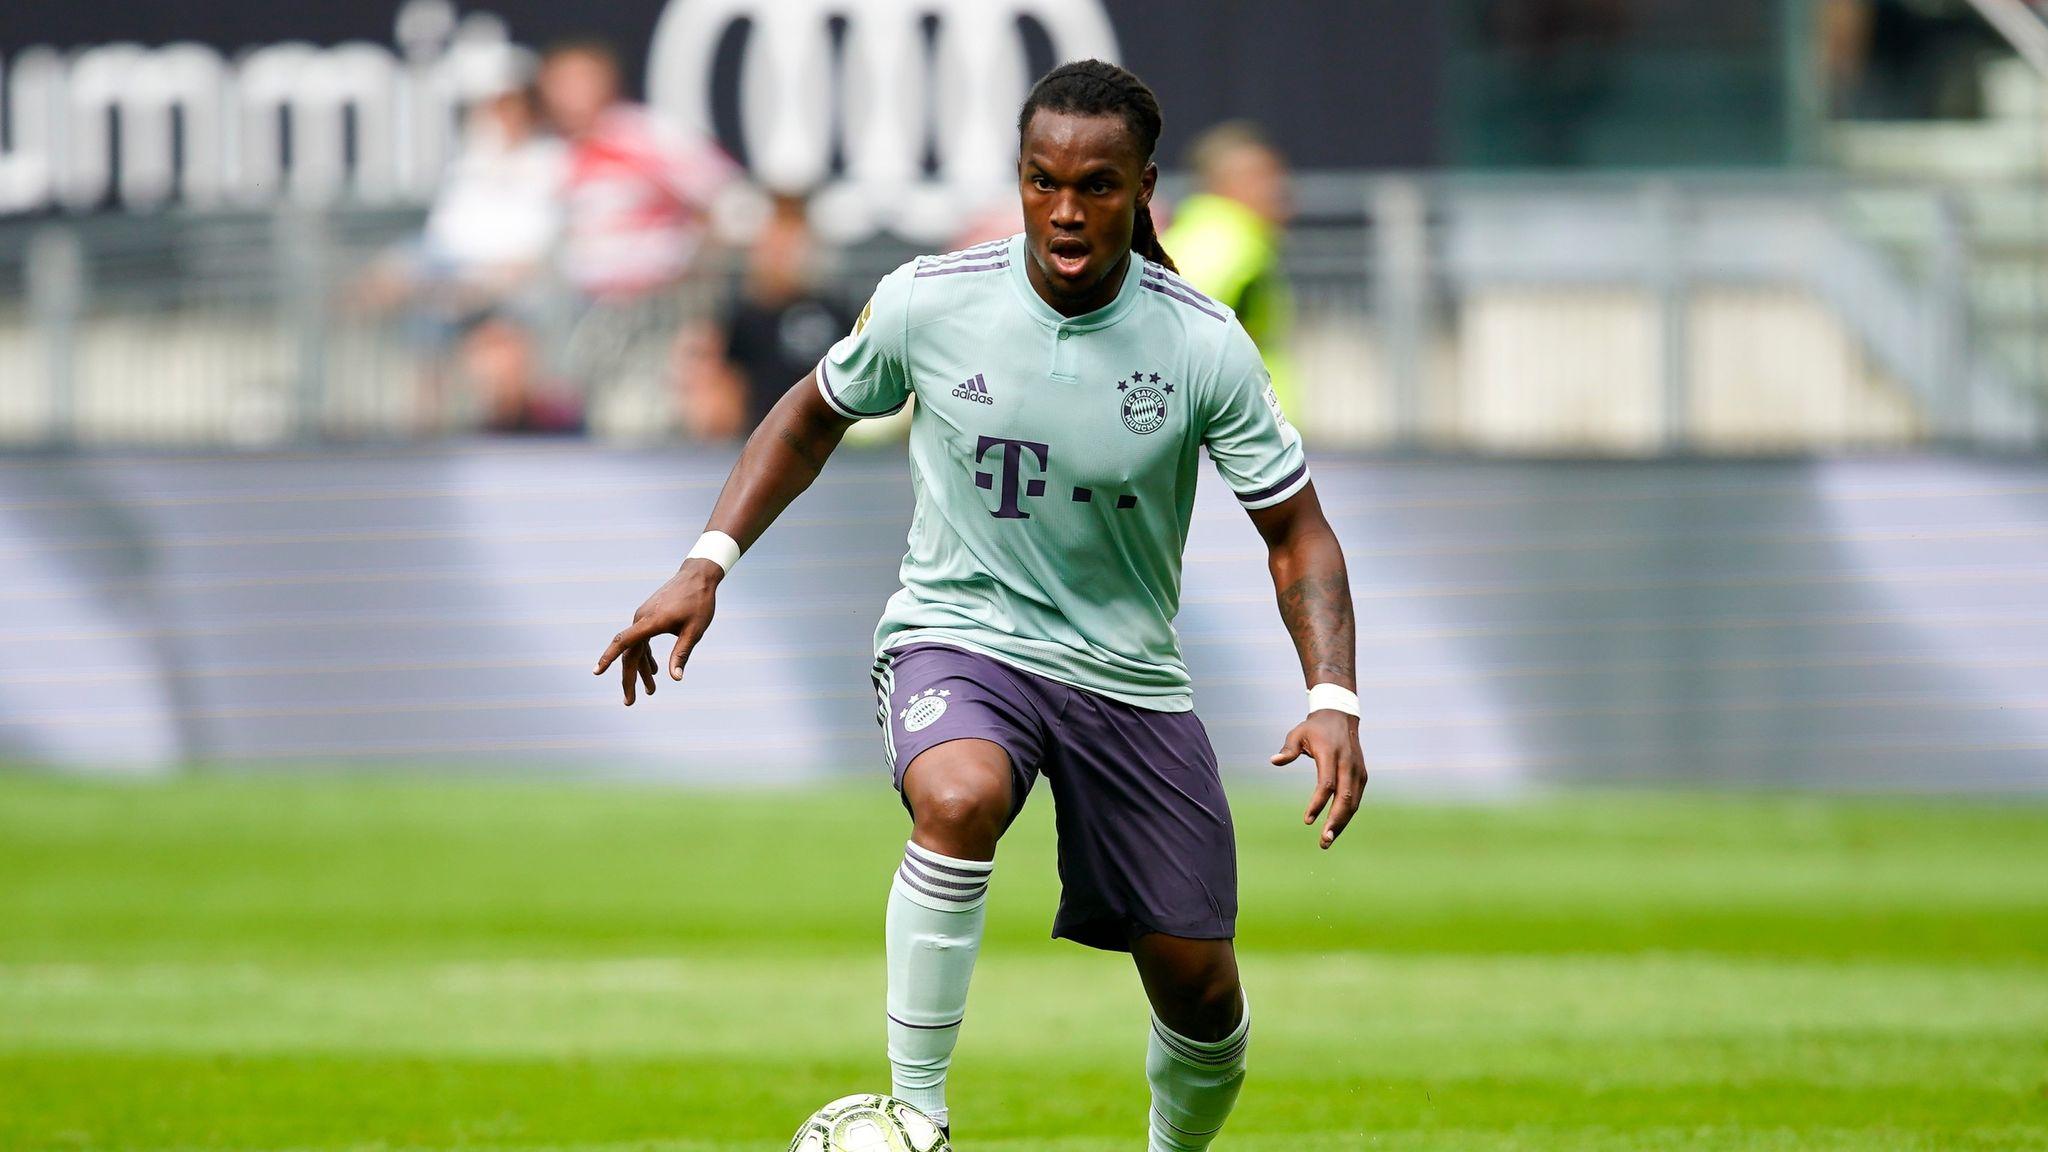 Renato Sanches improving at Bayern Munich, says Niko Kovac